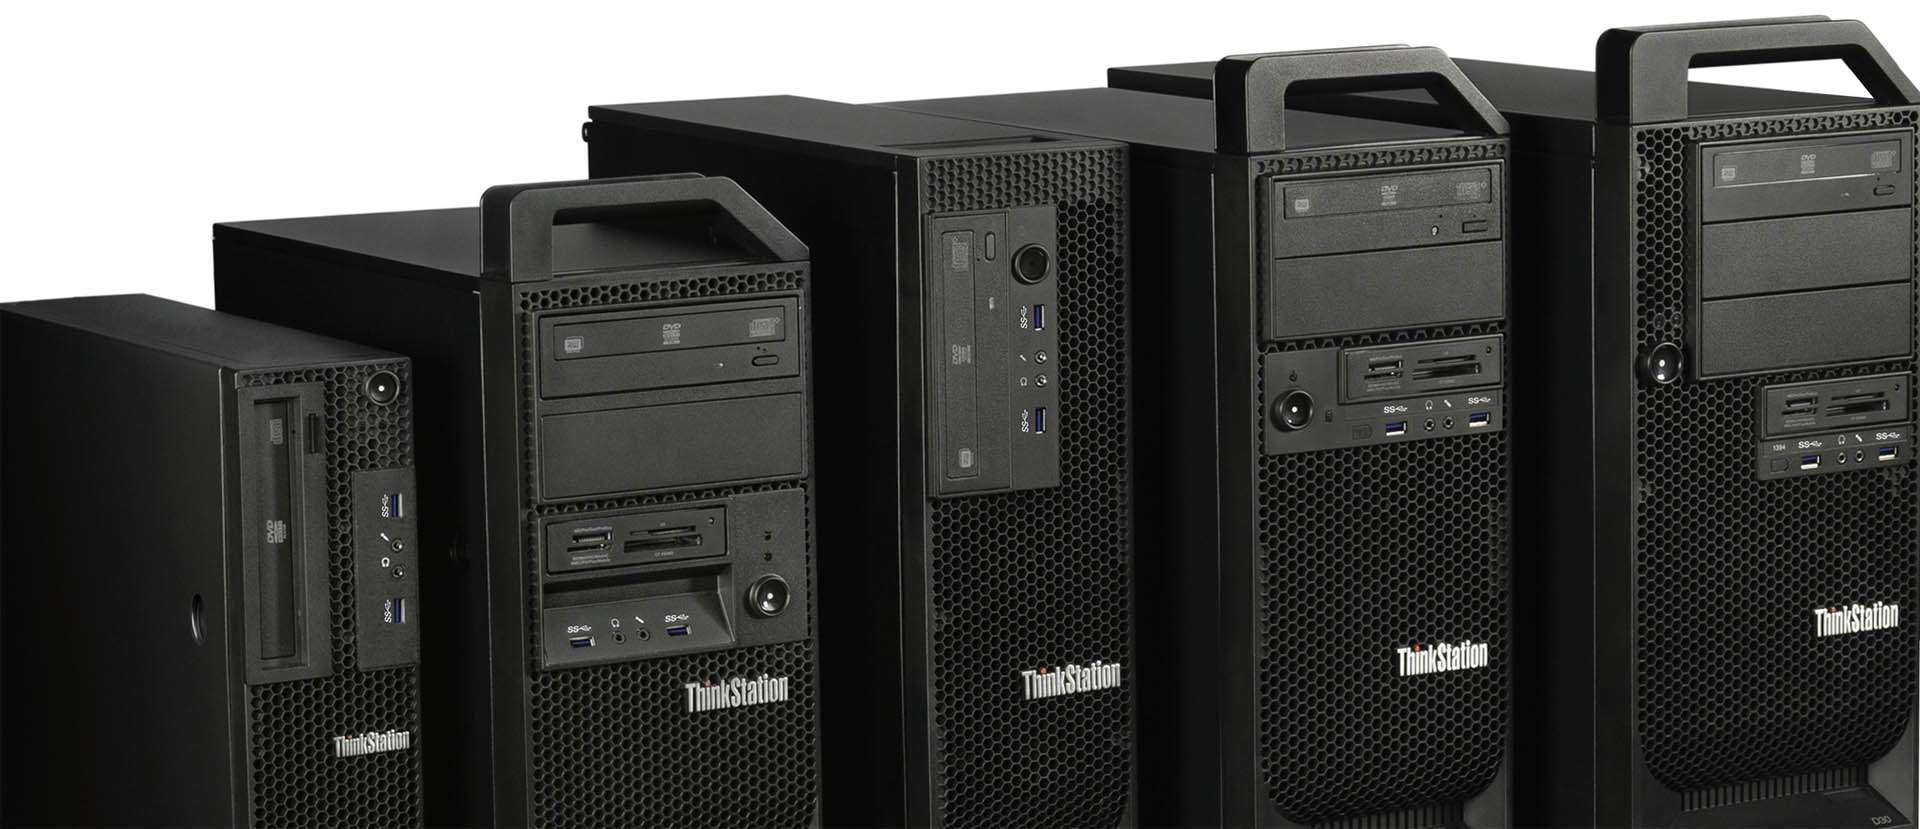 Image result for Refurbished Computers